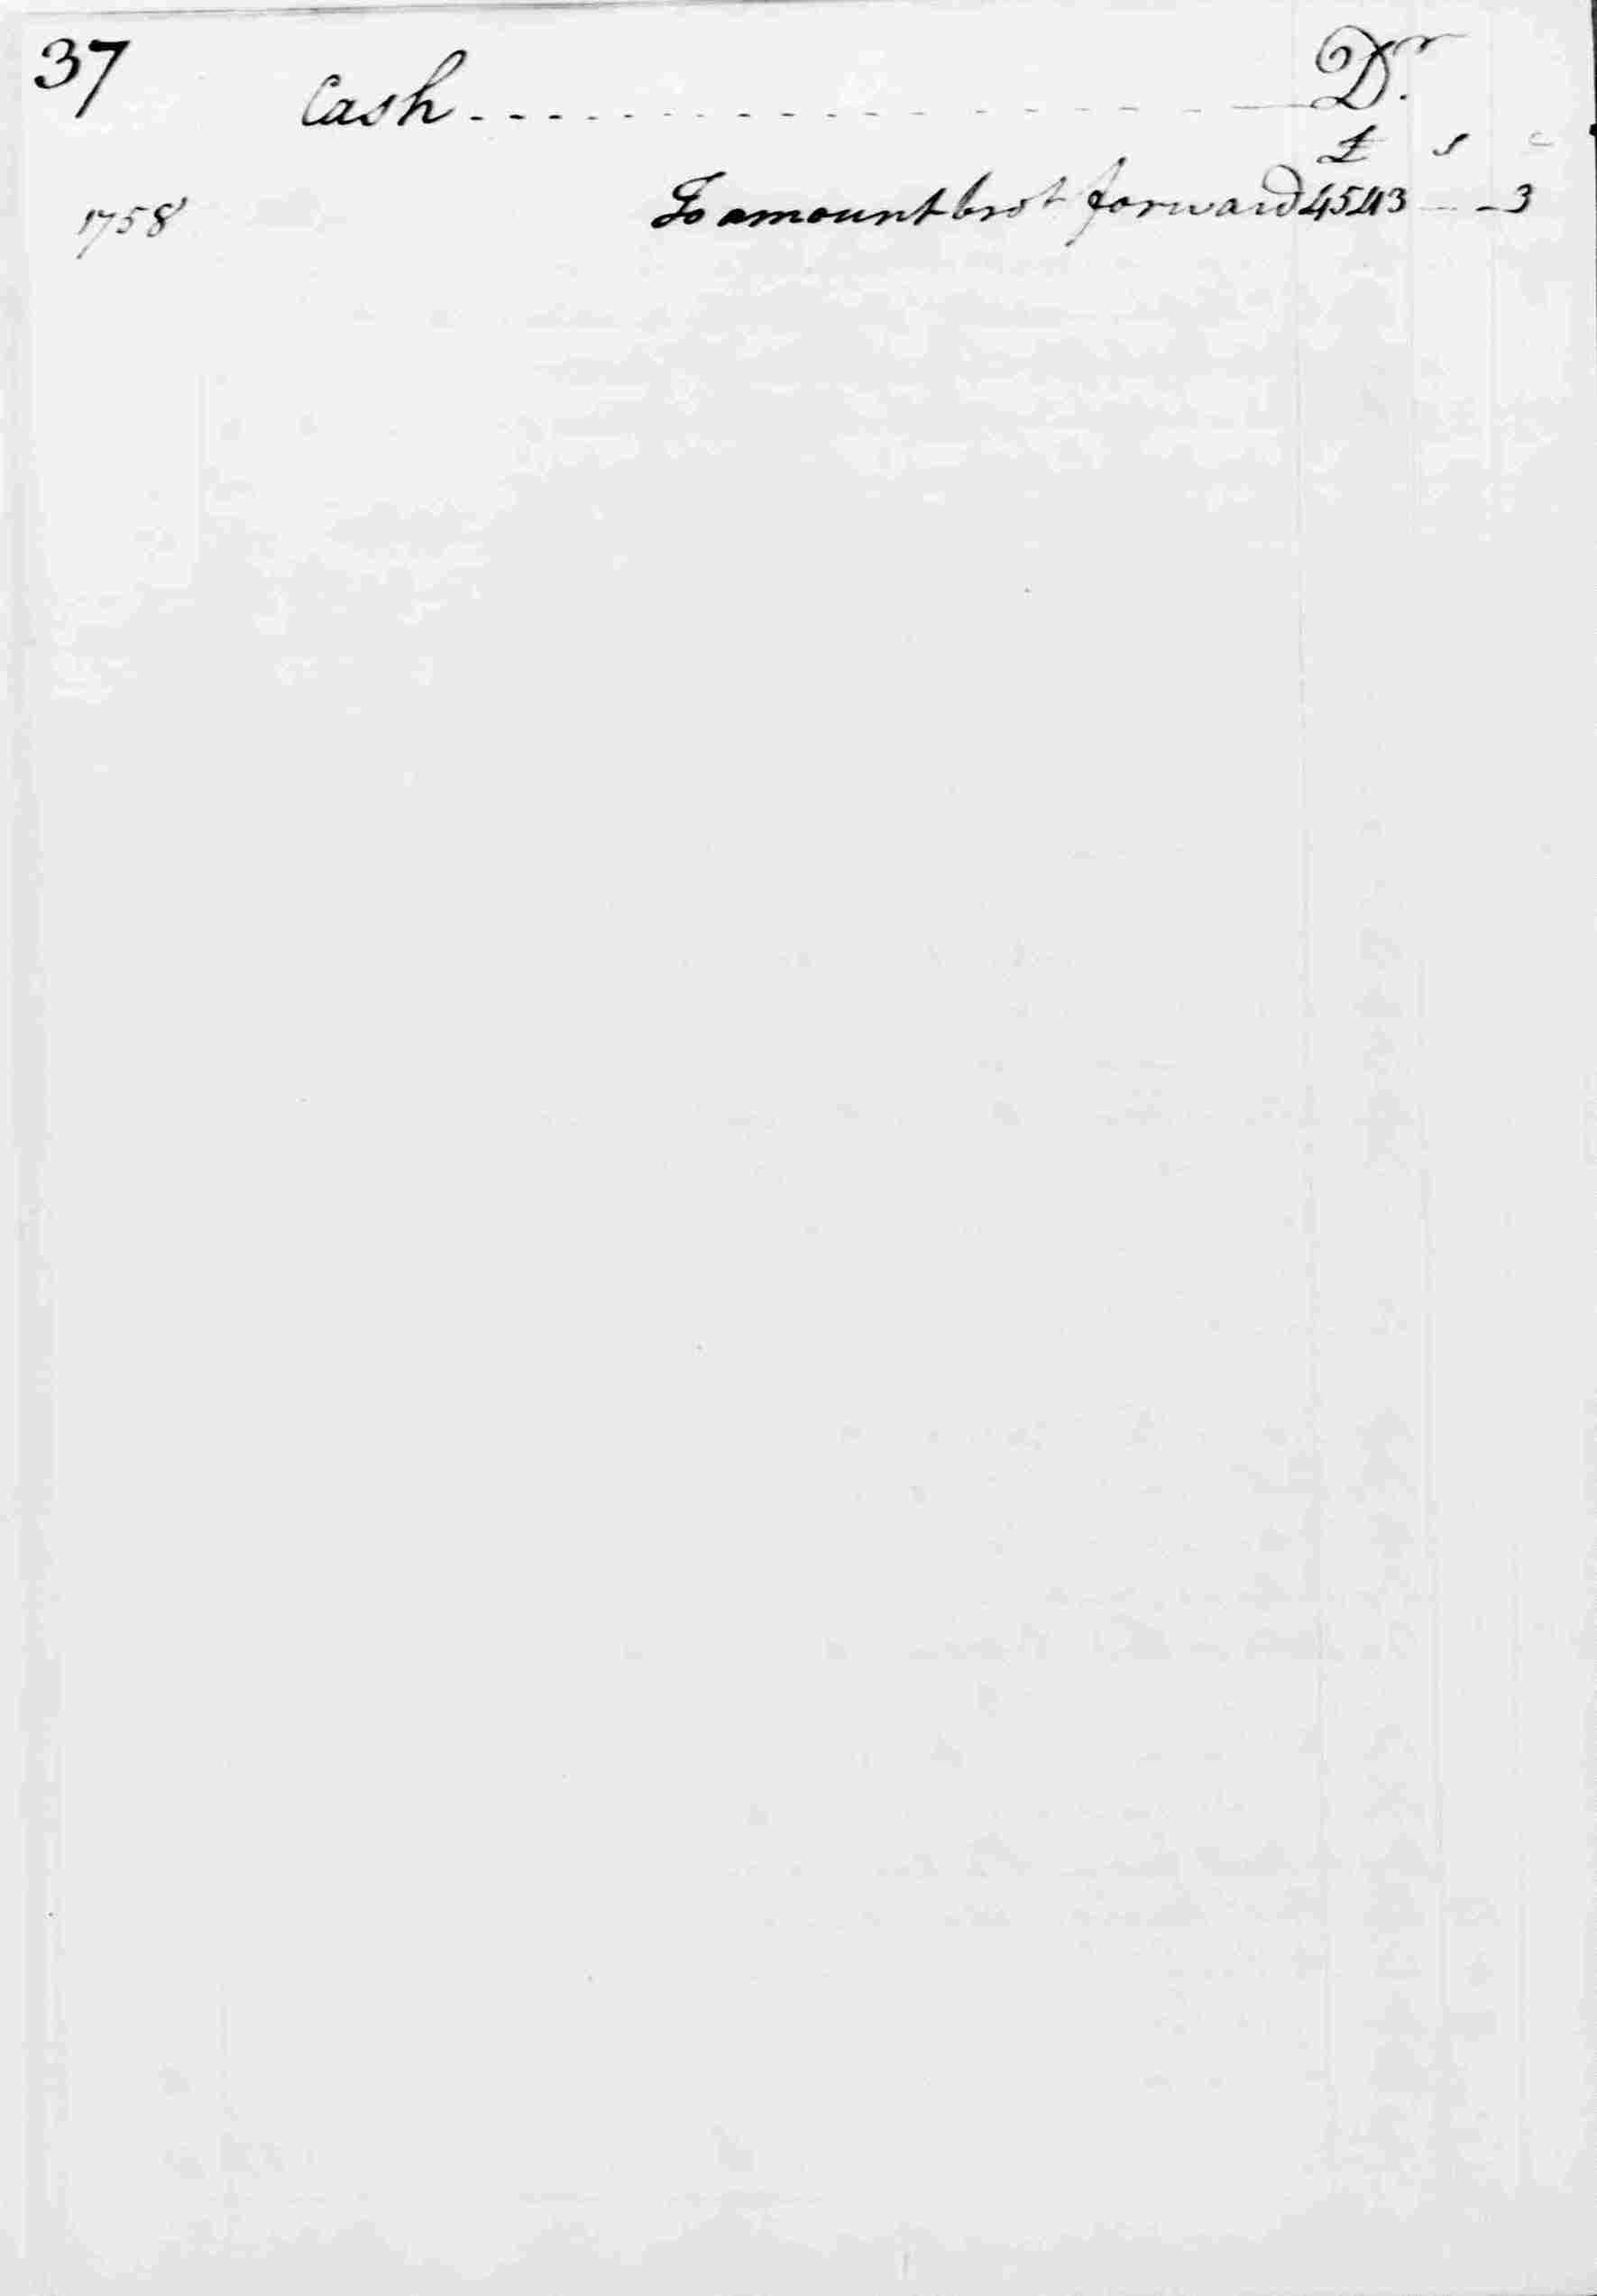 Ledger A, folio 37, left side